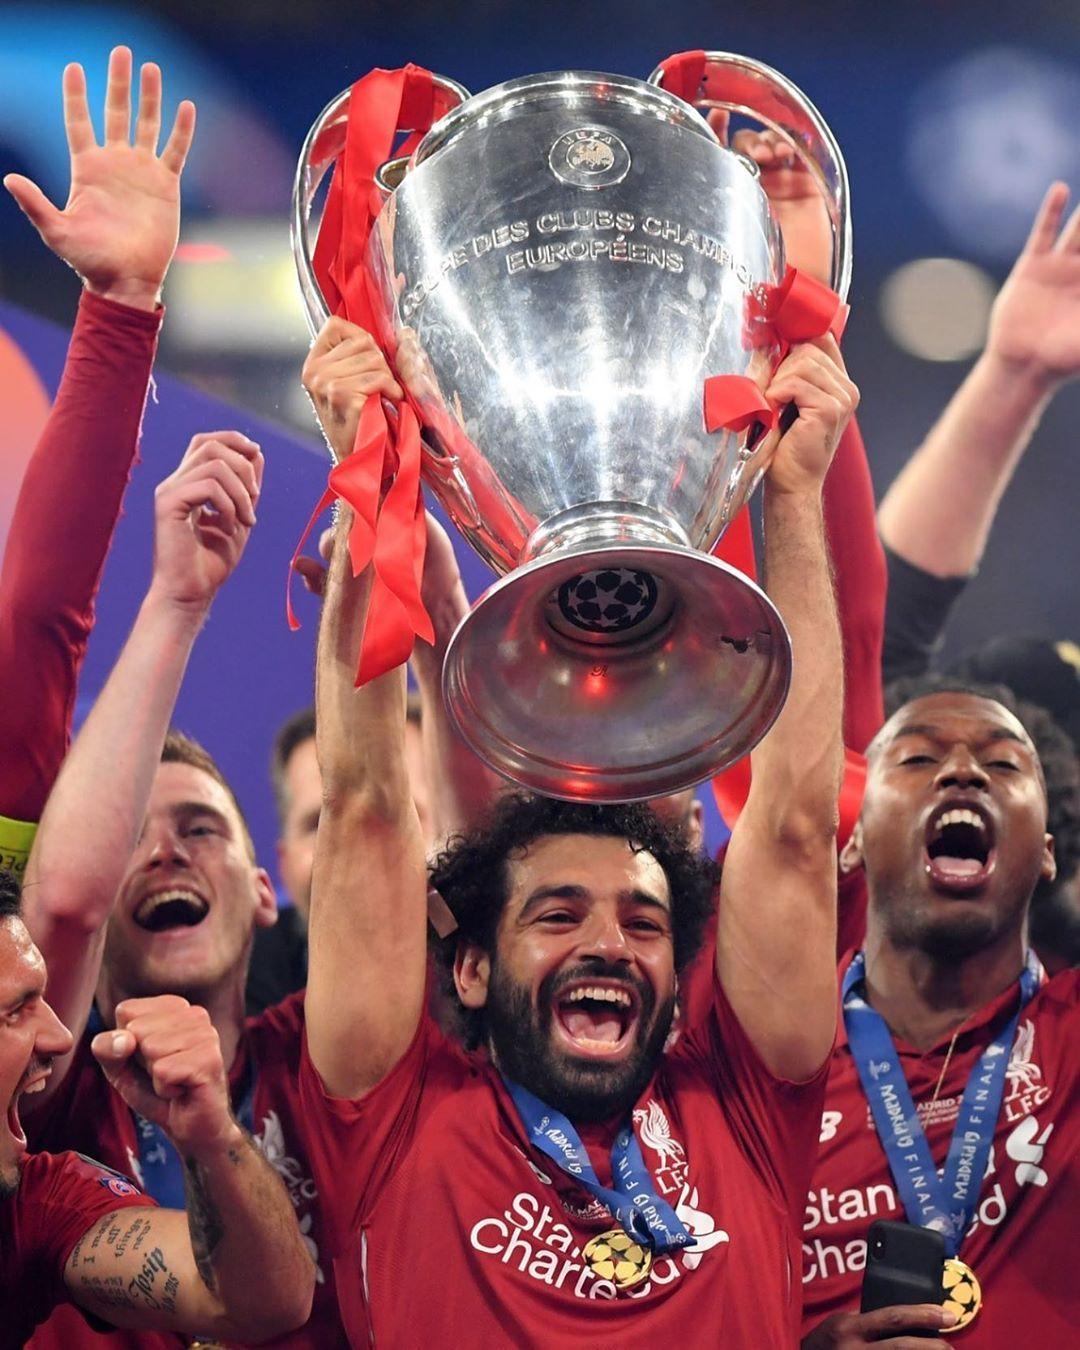 Believe, work hard, and it'll happen. Liverpool uefa